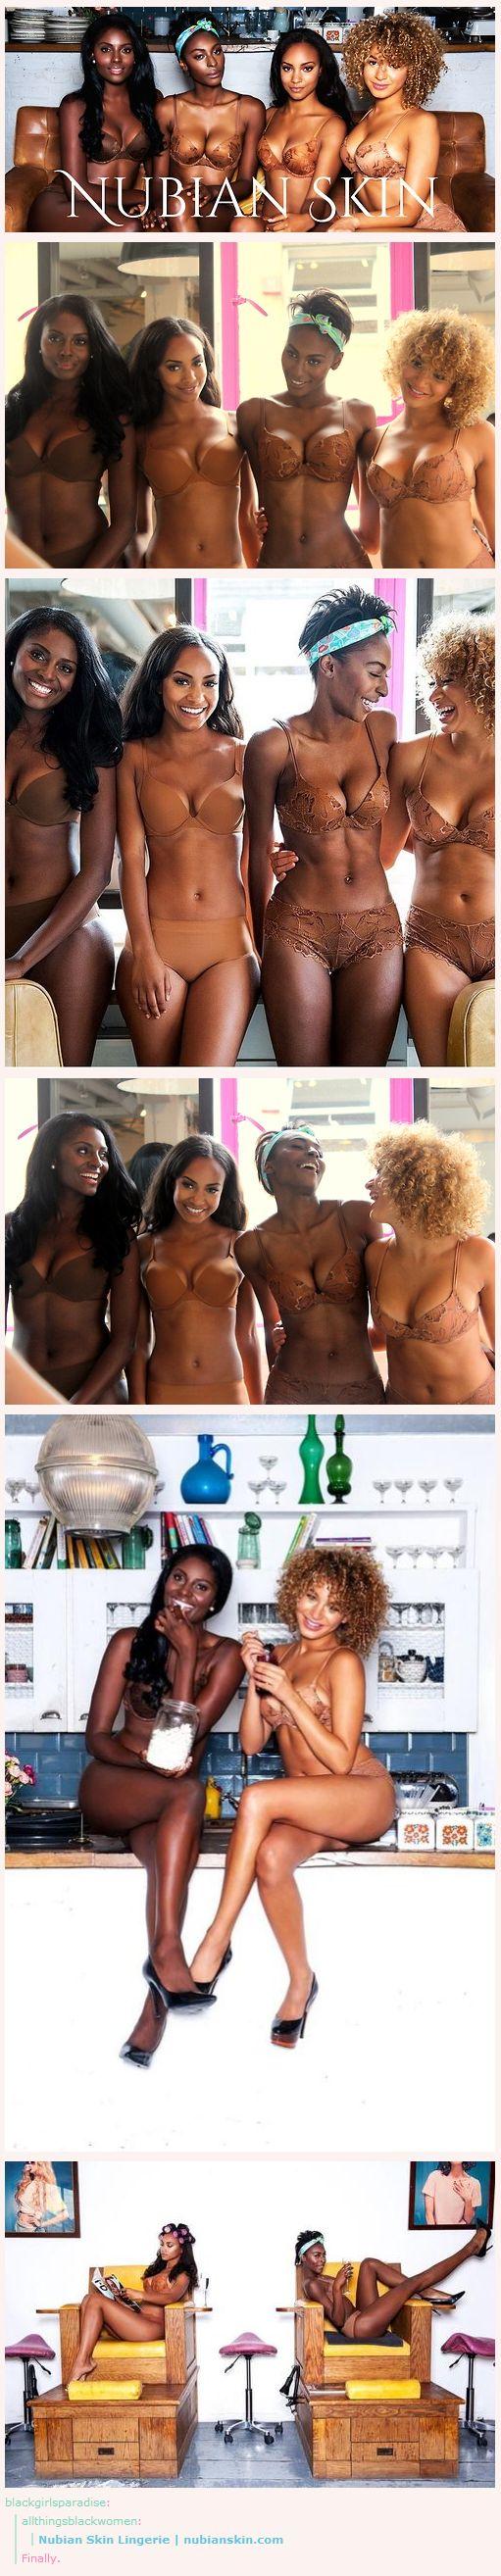 I LOVE THE SHADES OF BLACK SKIN.... Nubian Skin Lingerie   nubianskin.com